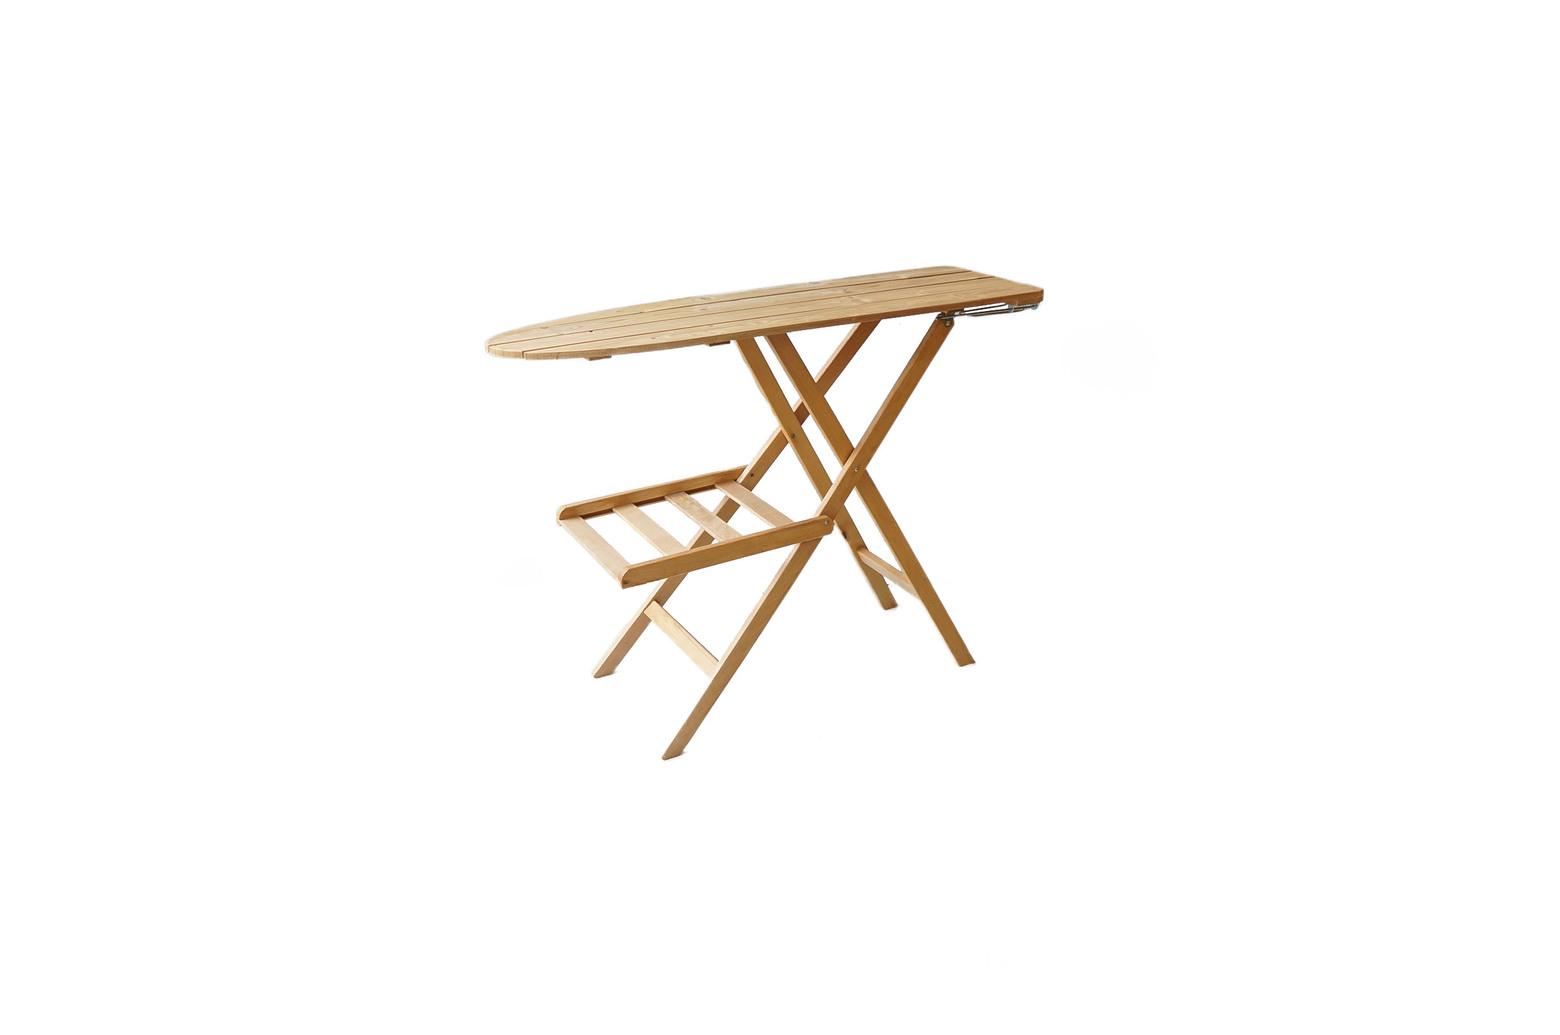 Wooden Ironing Board/木製 アイロン台 テーブル 飾り台 ナチュラル シャビー